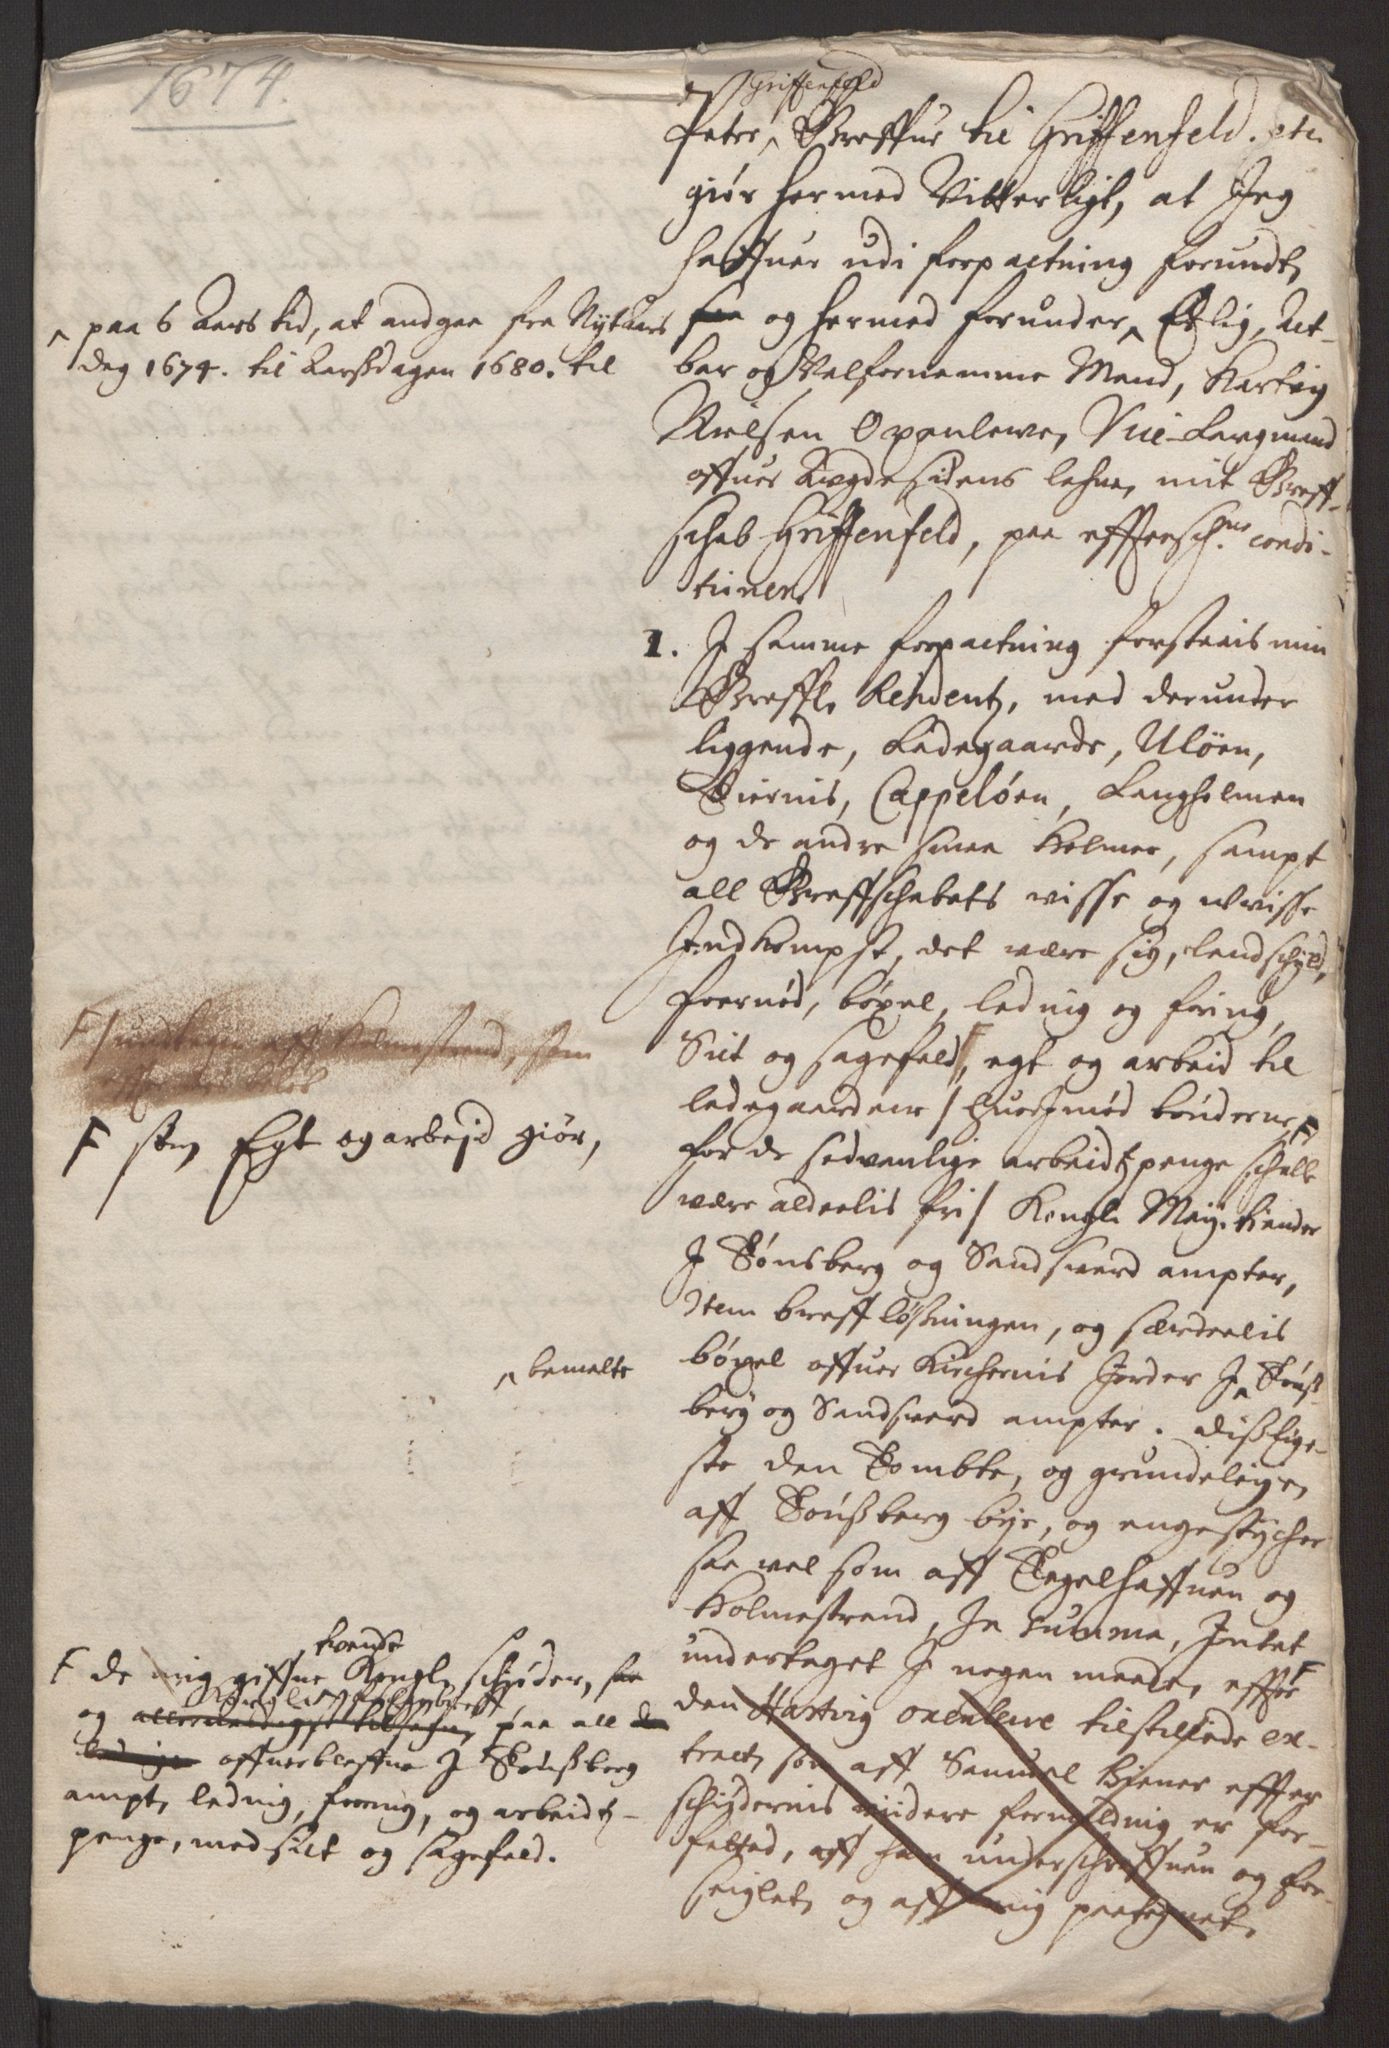 RA, Rentekammeret inntil 1814, Reviderte regnskaper, Fogderegnskap, R32/L1843: Fogderegnskap Jarlsberg grevskap, 1674-1675, s. 105